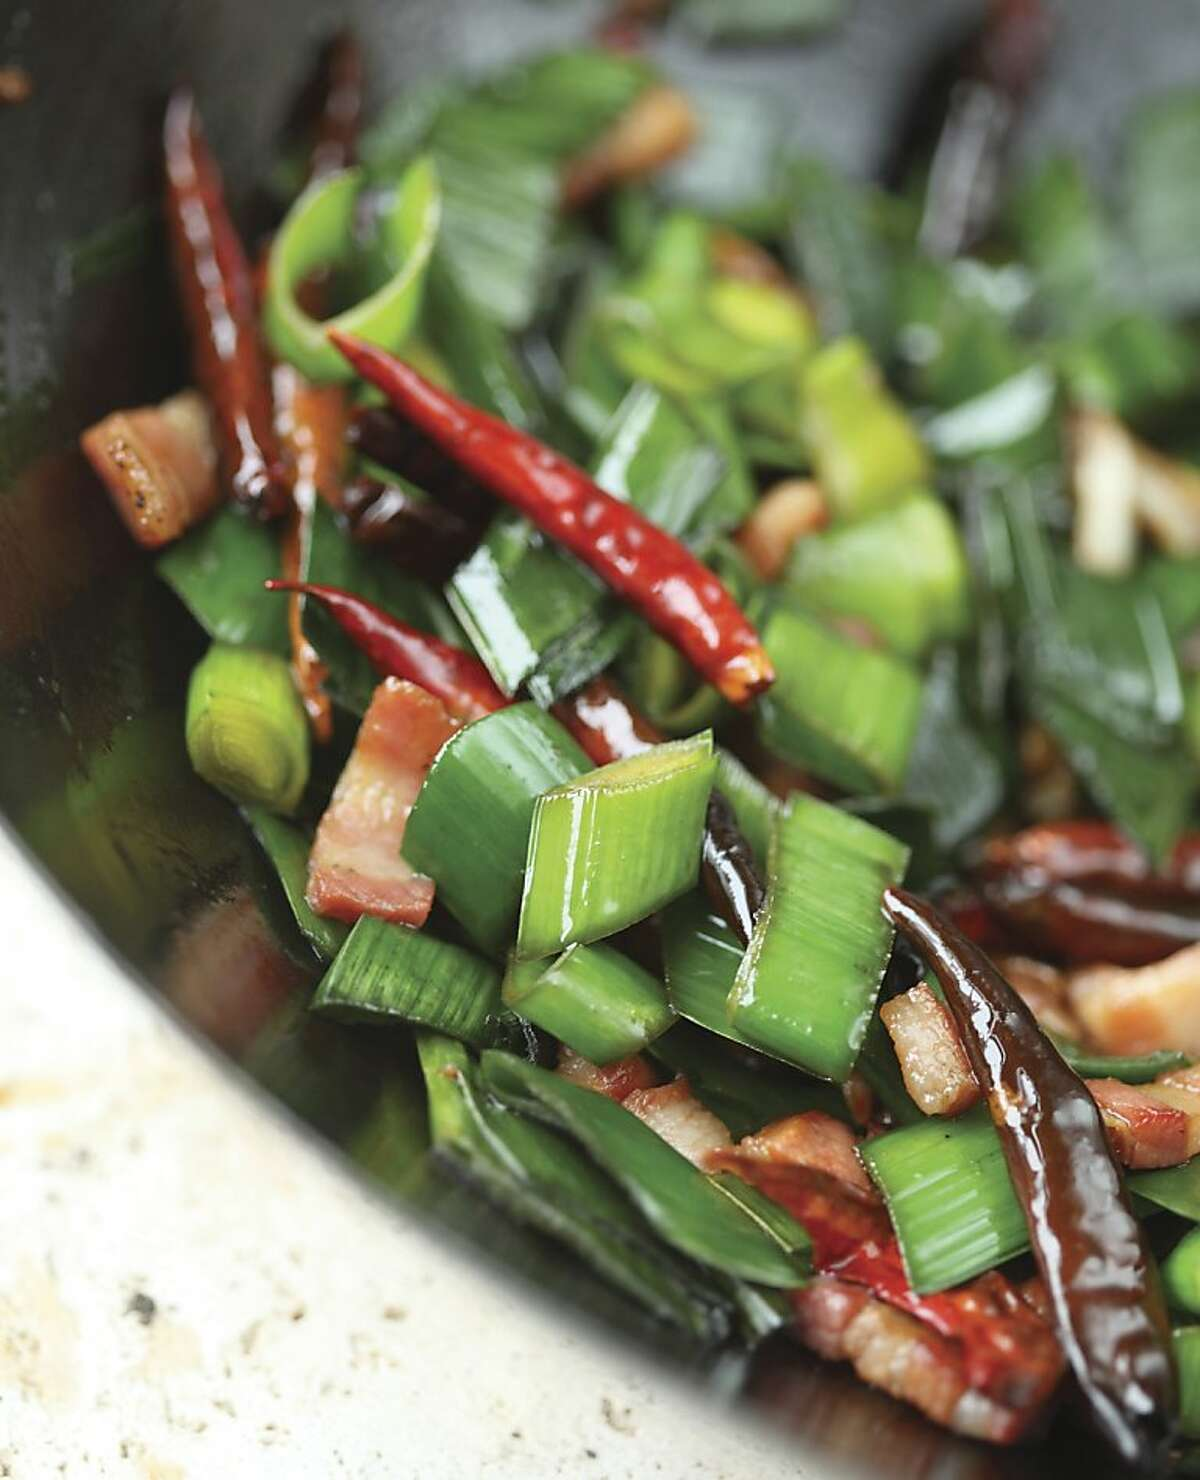 "Leek Greens Stir-Fry from the book, ?'Root to Stalk Cooking,?"" by Tara Duggan from Ten Speed Press."